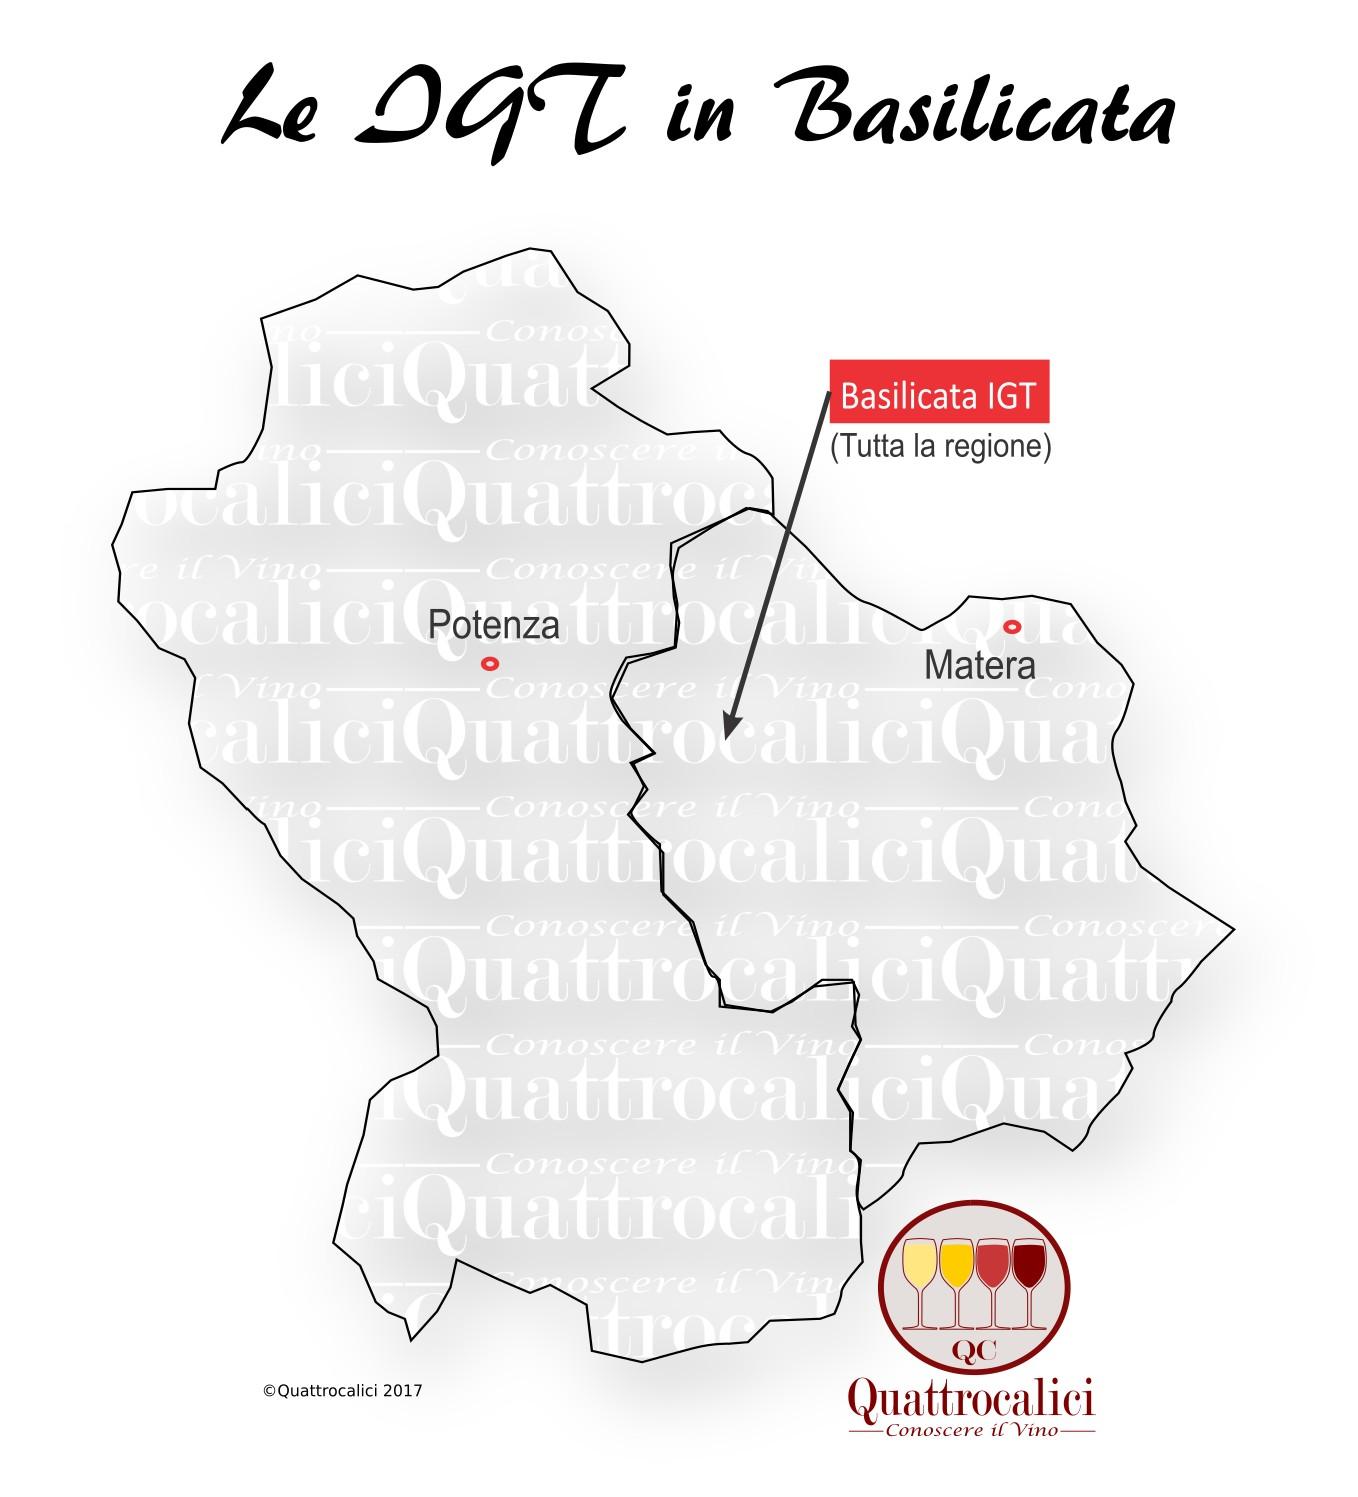 Le IGT in Basilicata